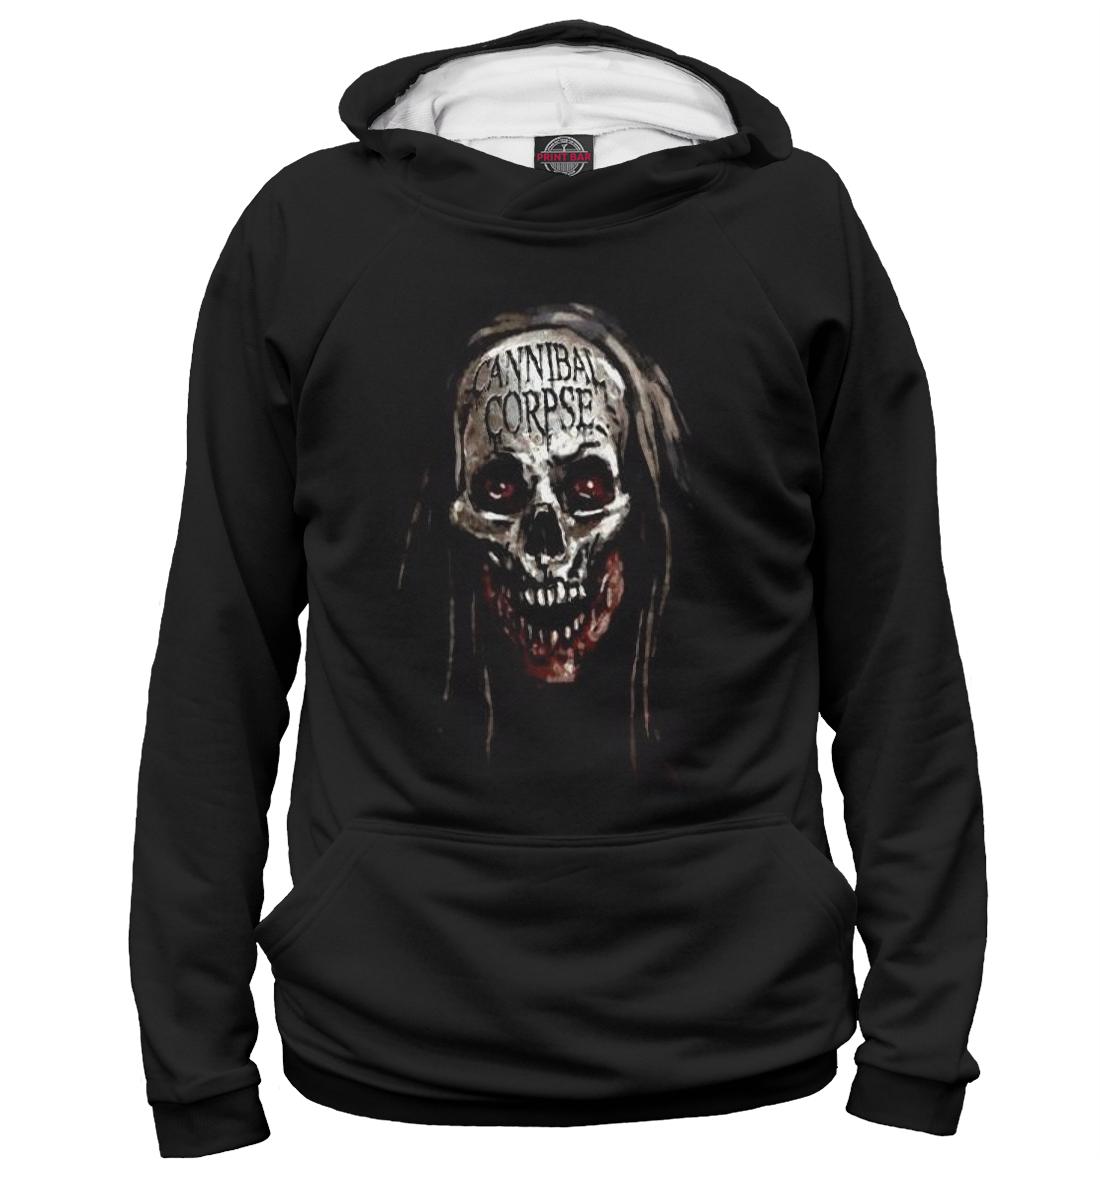 Купить Cannibal Corpse, Printbar, Худи, MZK-645416-hud-2